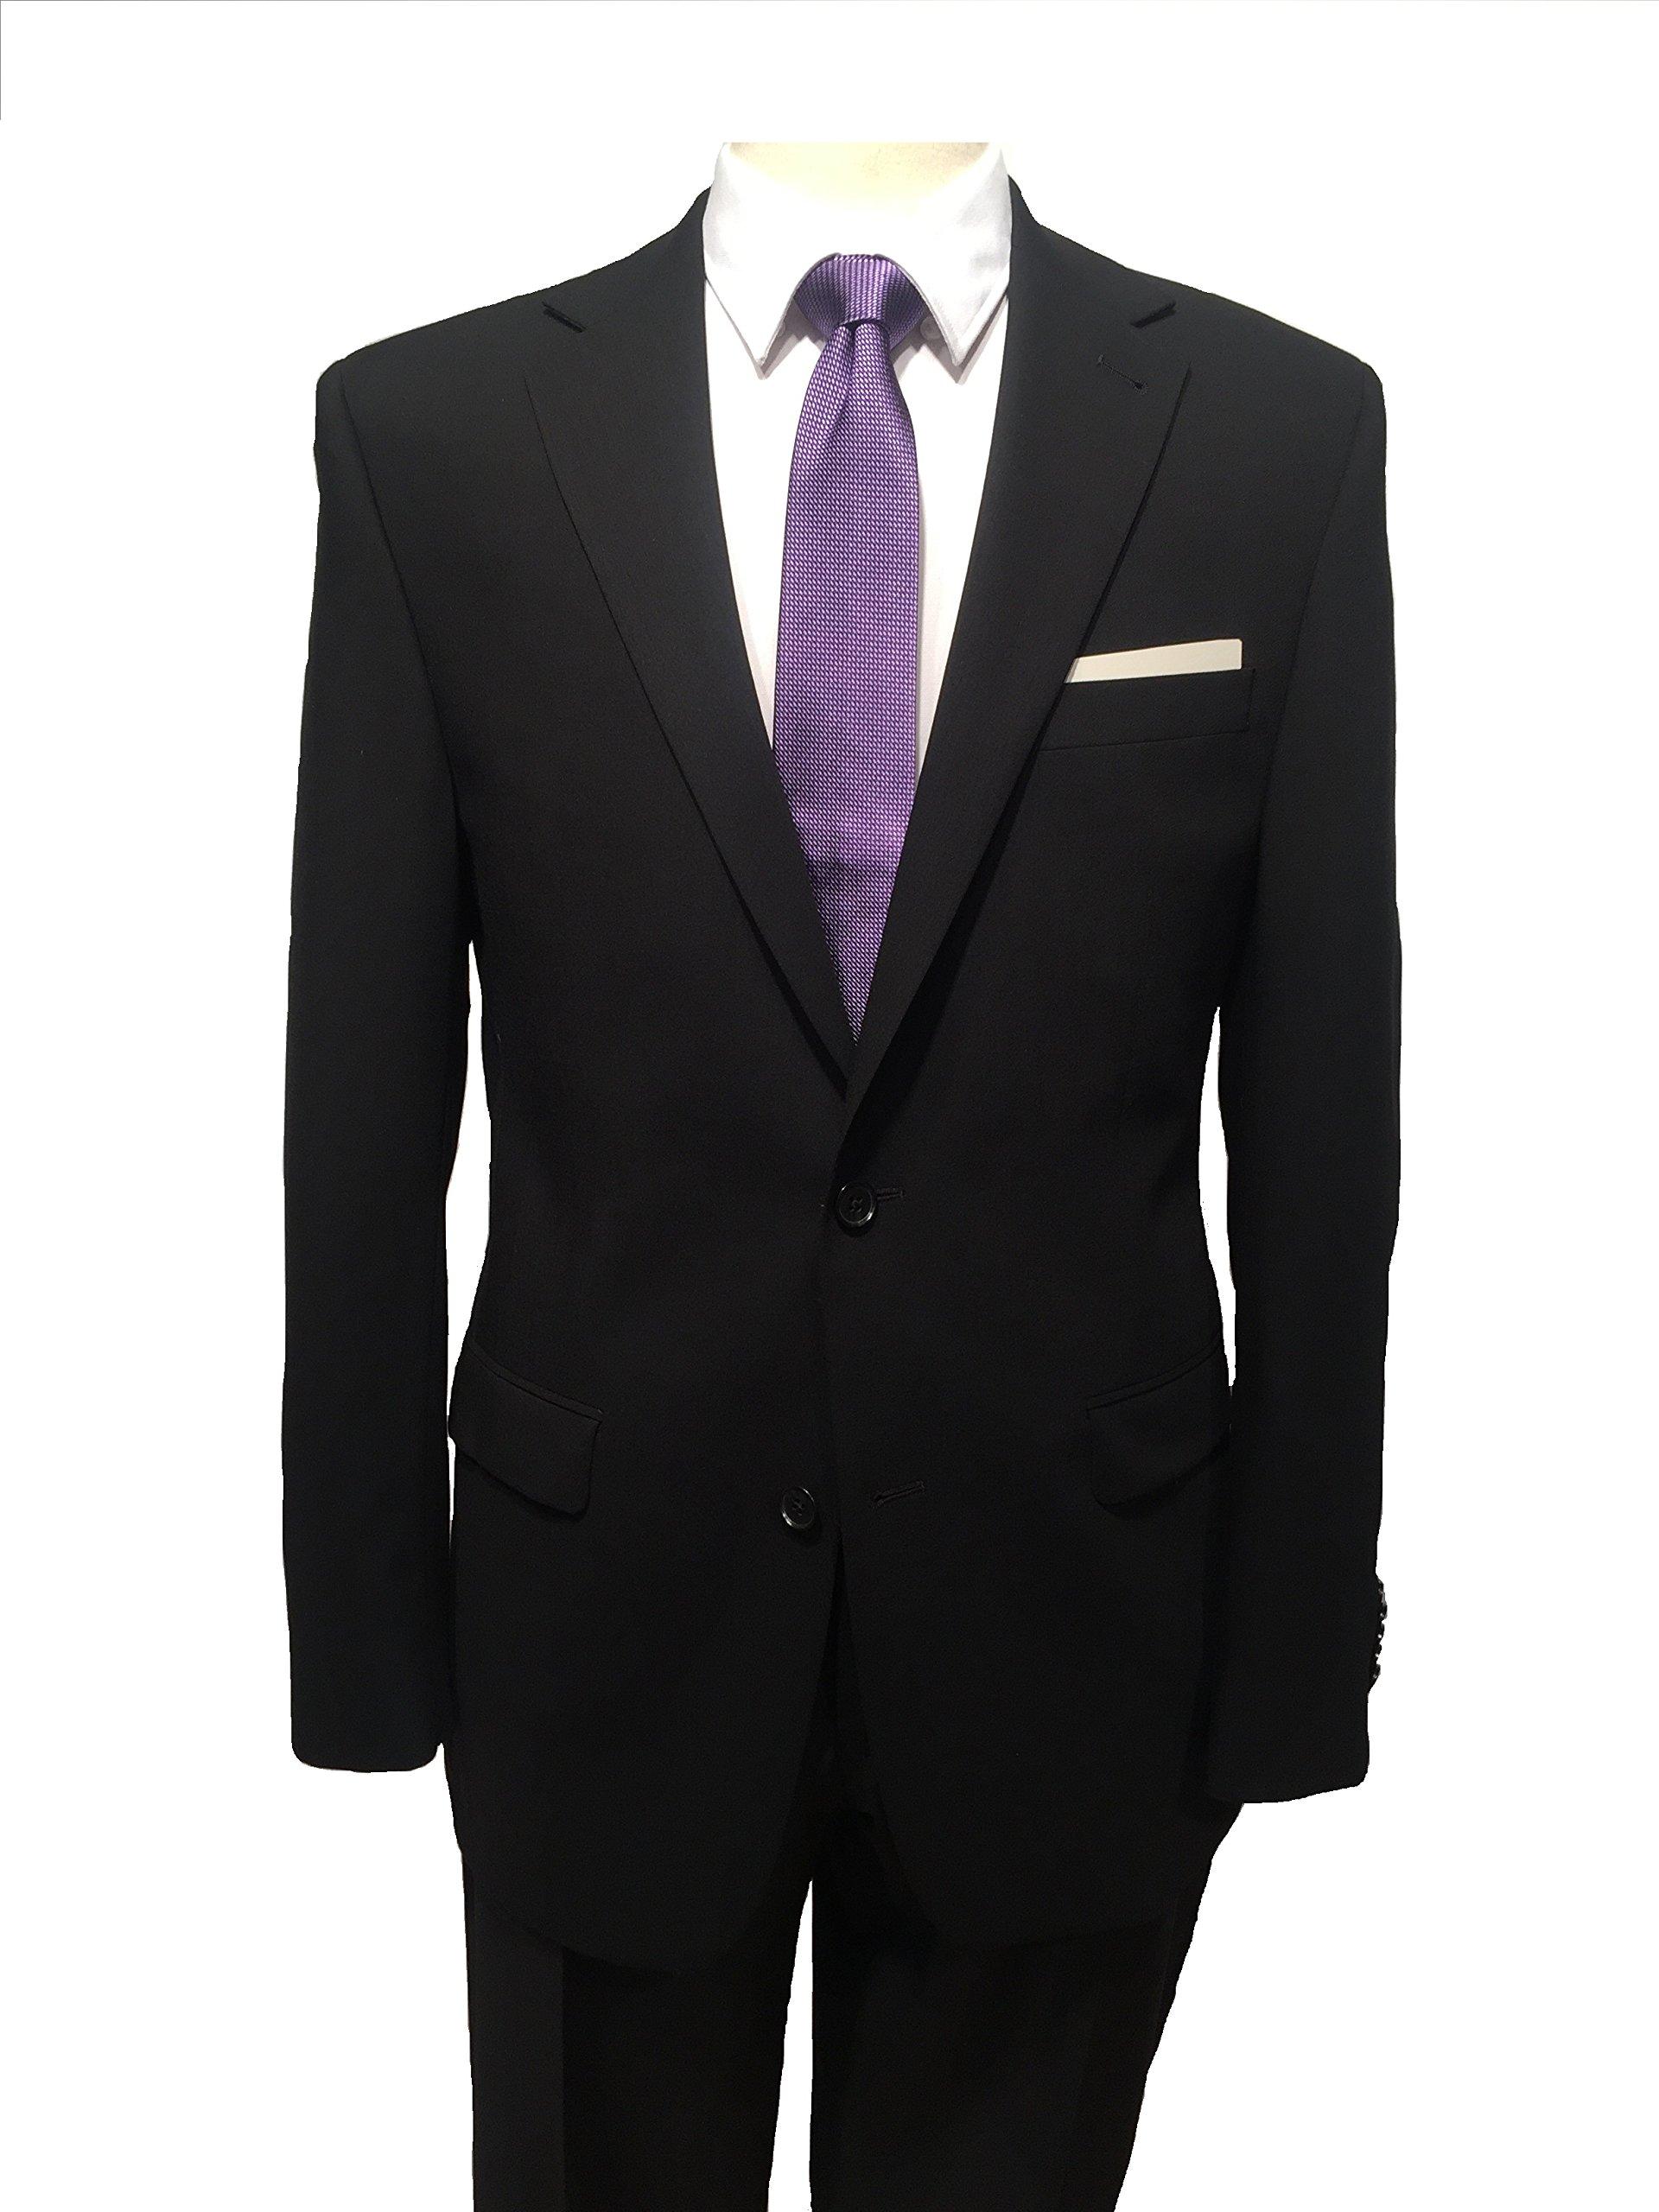 S. Cohen Men's Travel, Modern Fit Smart Suit 44 Regular Black